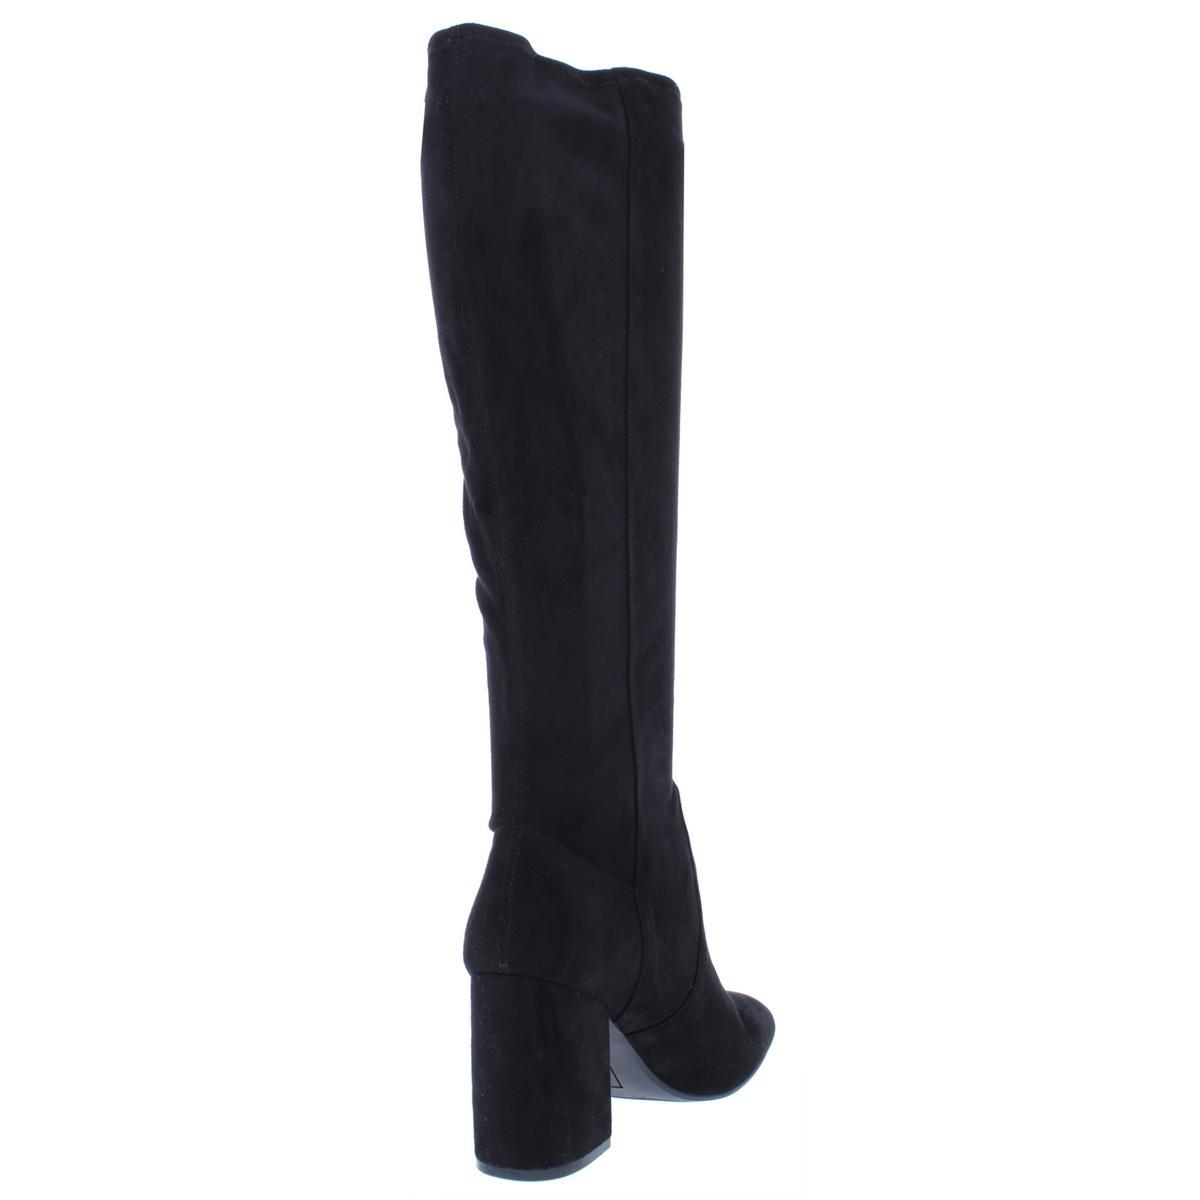 Seven-Dials-Womens-Britney-Solid-Square-Toe-Dress-Boots-Heels-BHFO-6188 miniatura 4